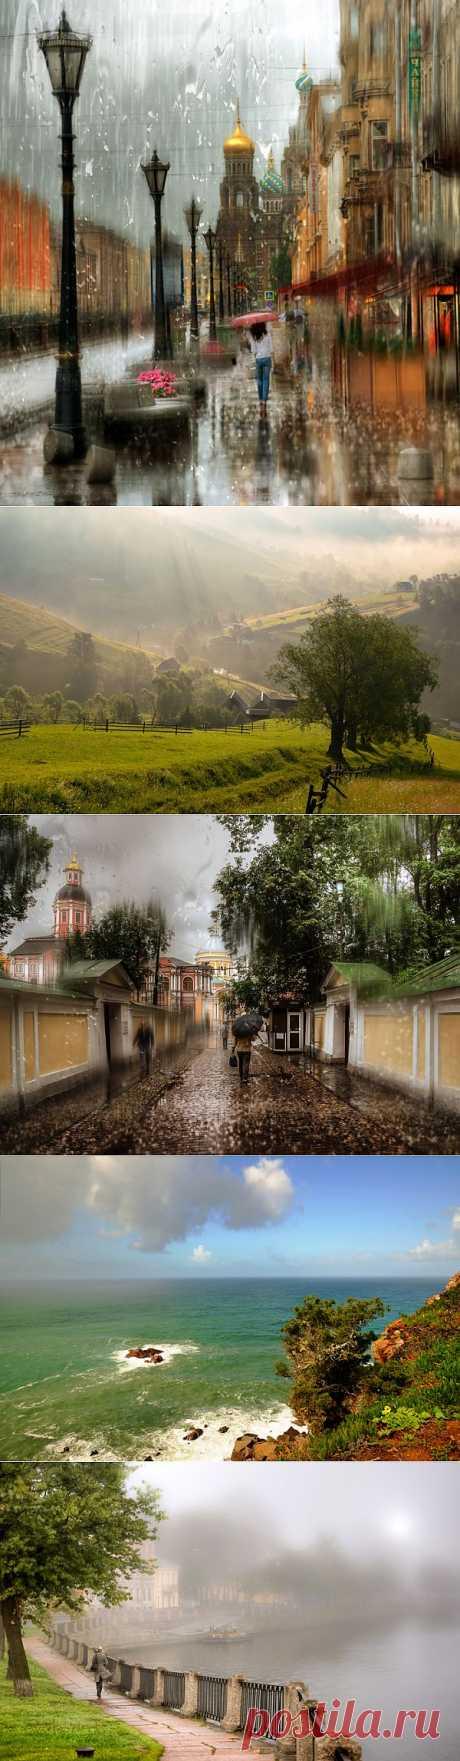 Дождь, солнце и туман в фотографиях Гордеева Эдуарда .